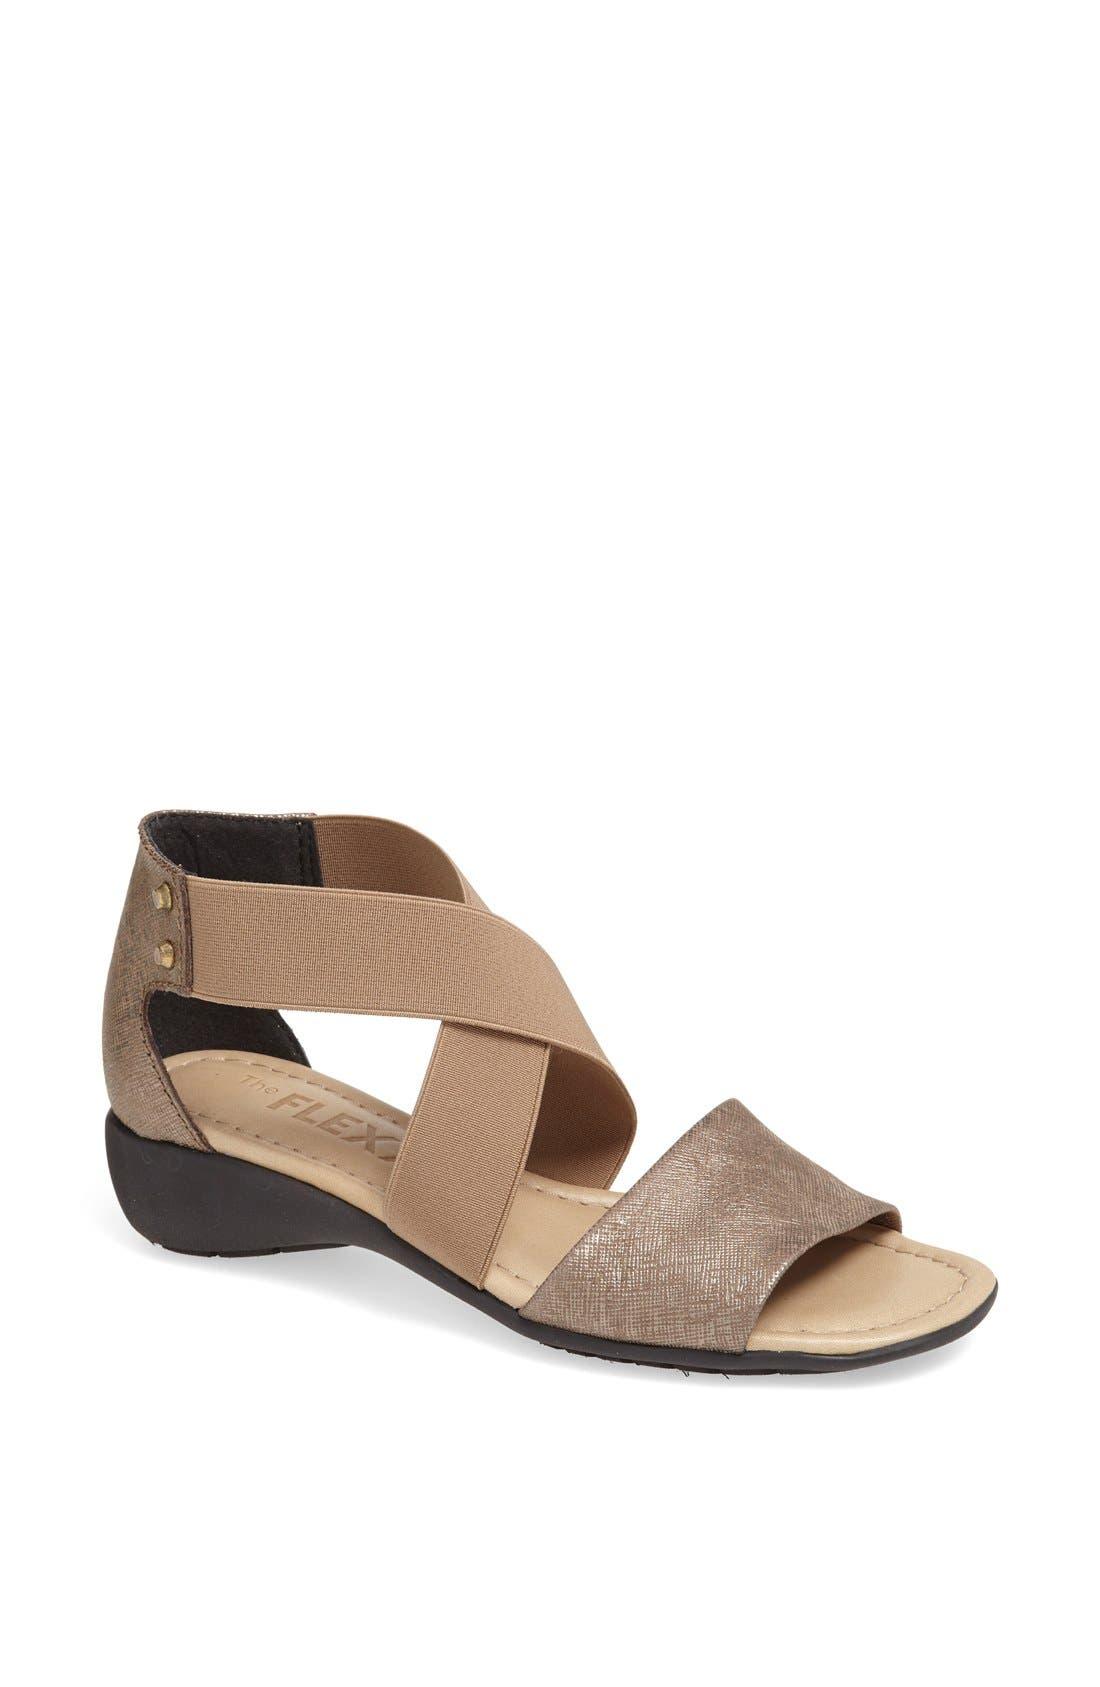 Alternate Image 1 Selected - The FLEXX 'Sunglass' Leather & Elastic Sandal